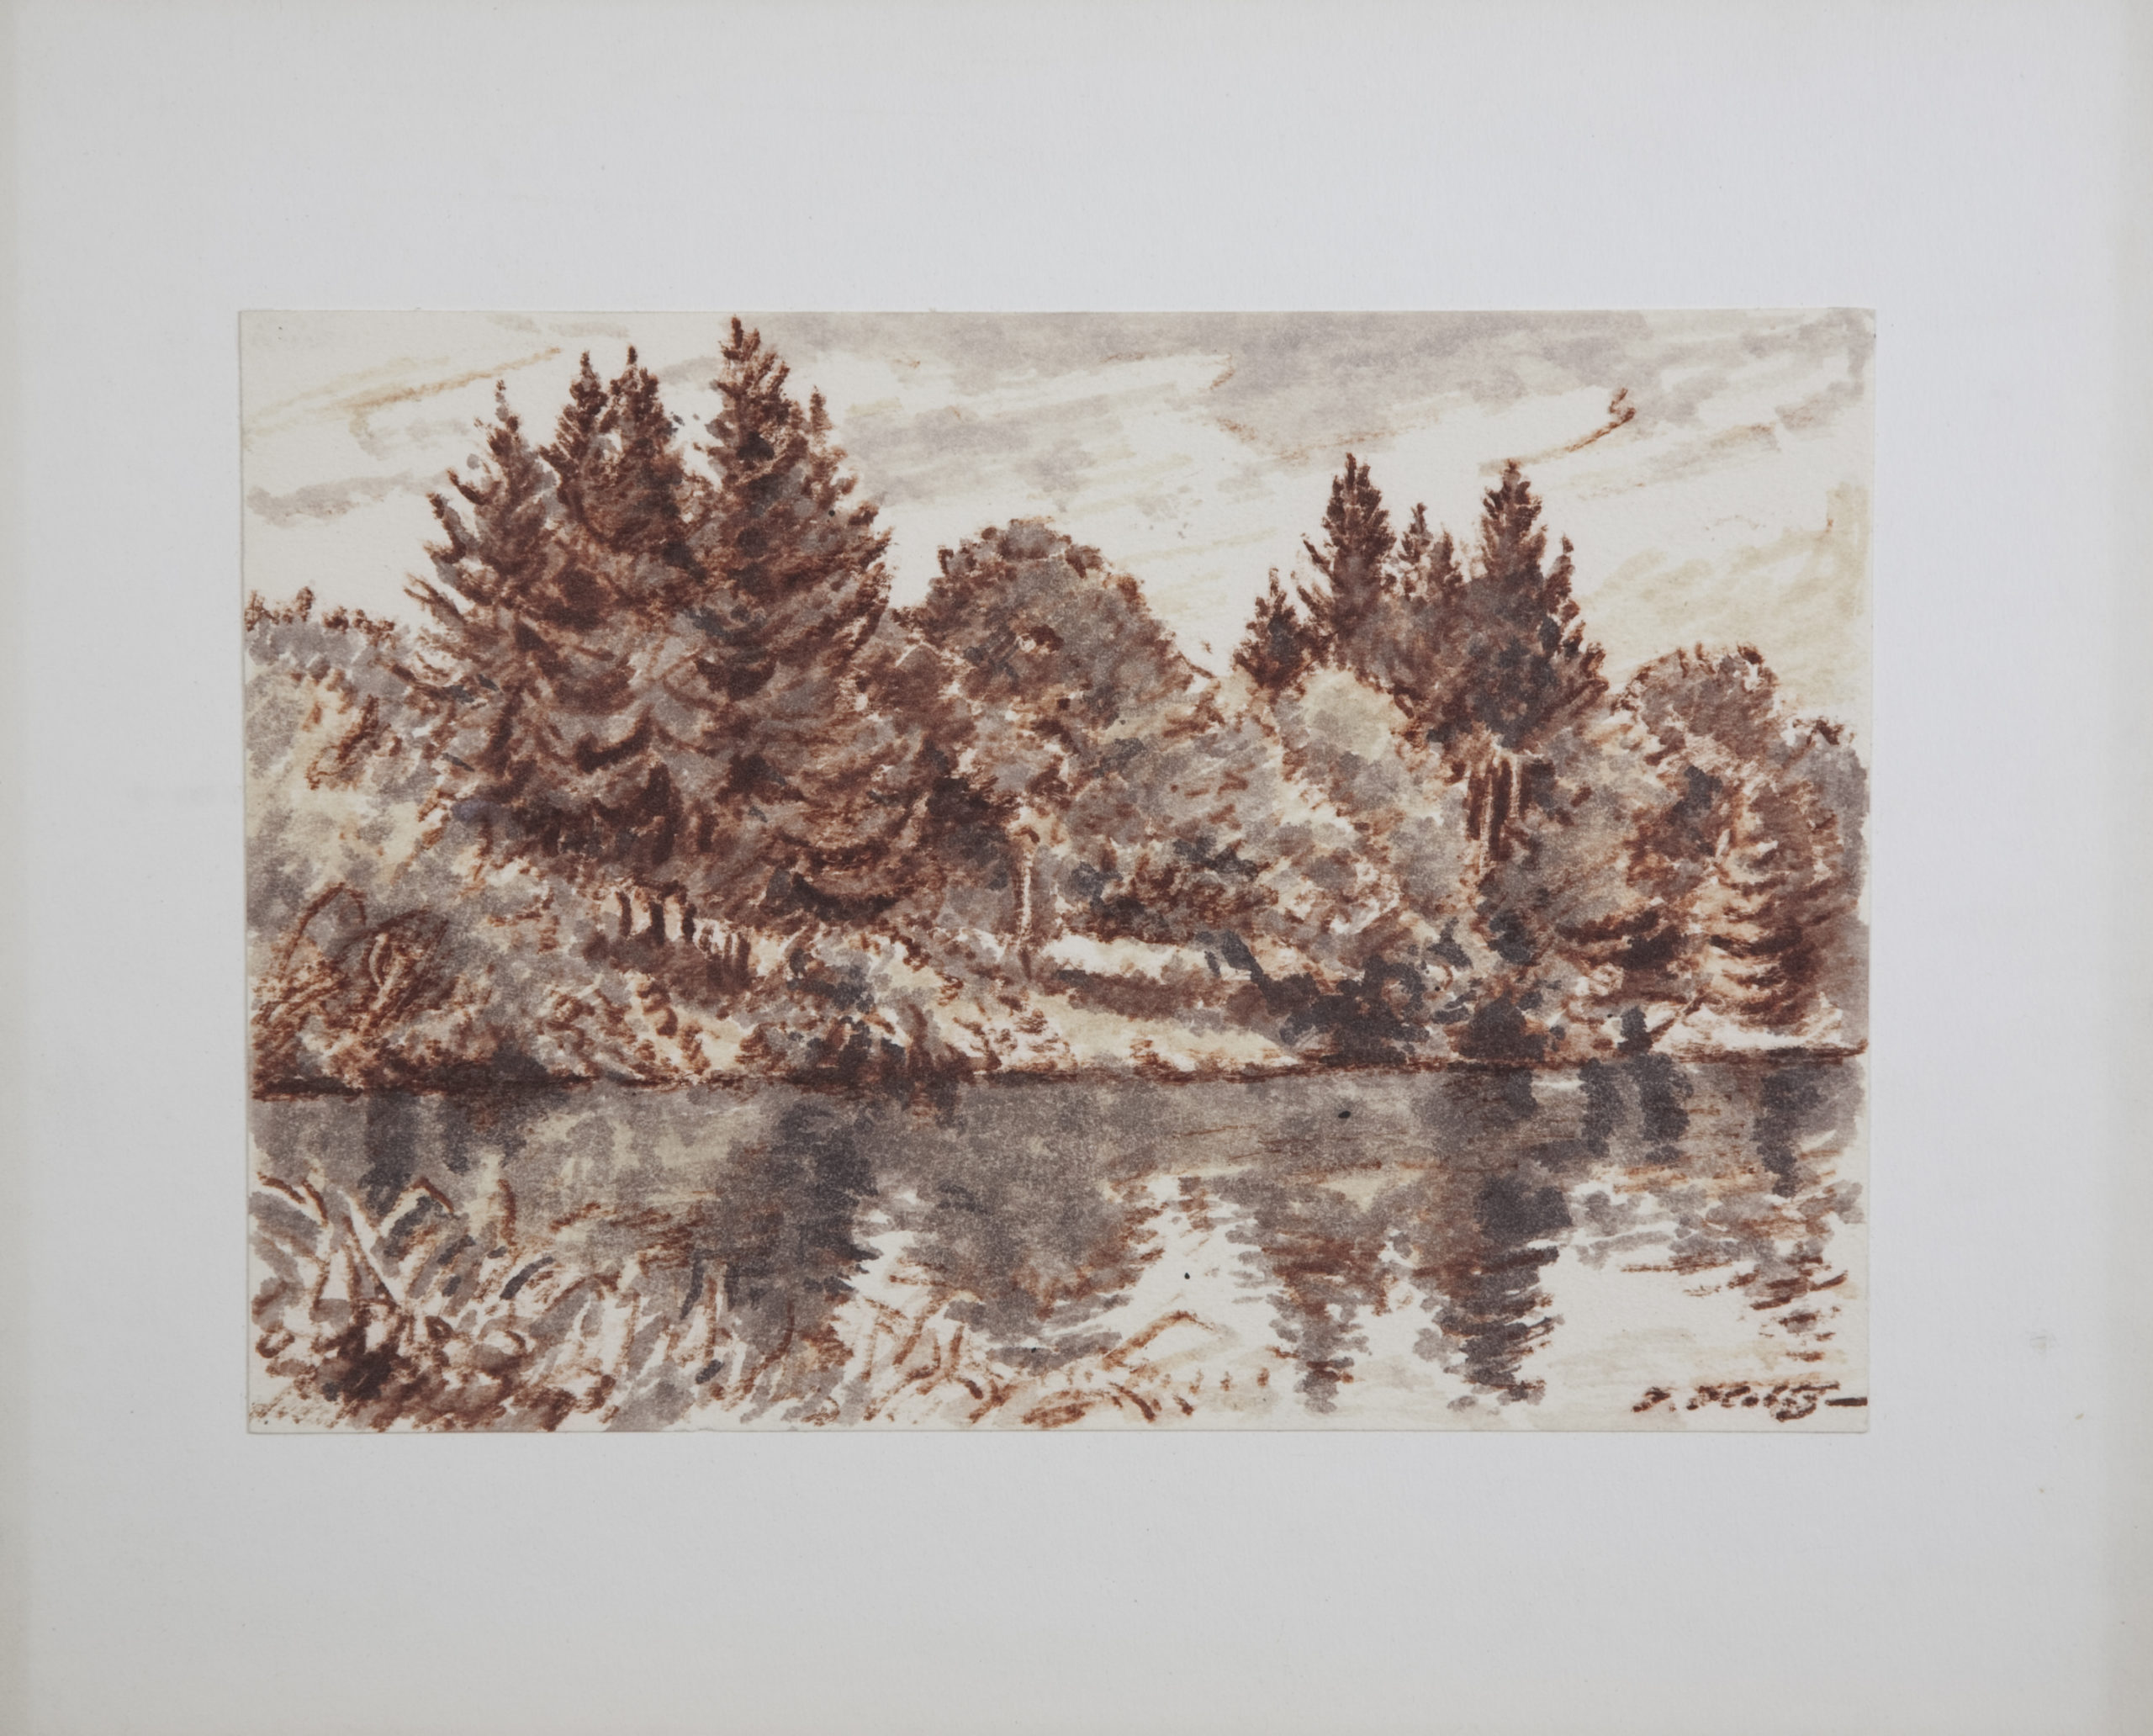 D35 The Lake 1 - Colored Marker - 10 x 7 - Matt: 15 x 12 - No Frame